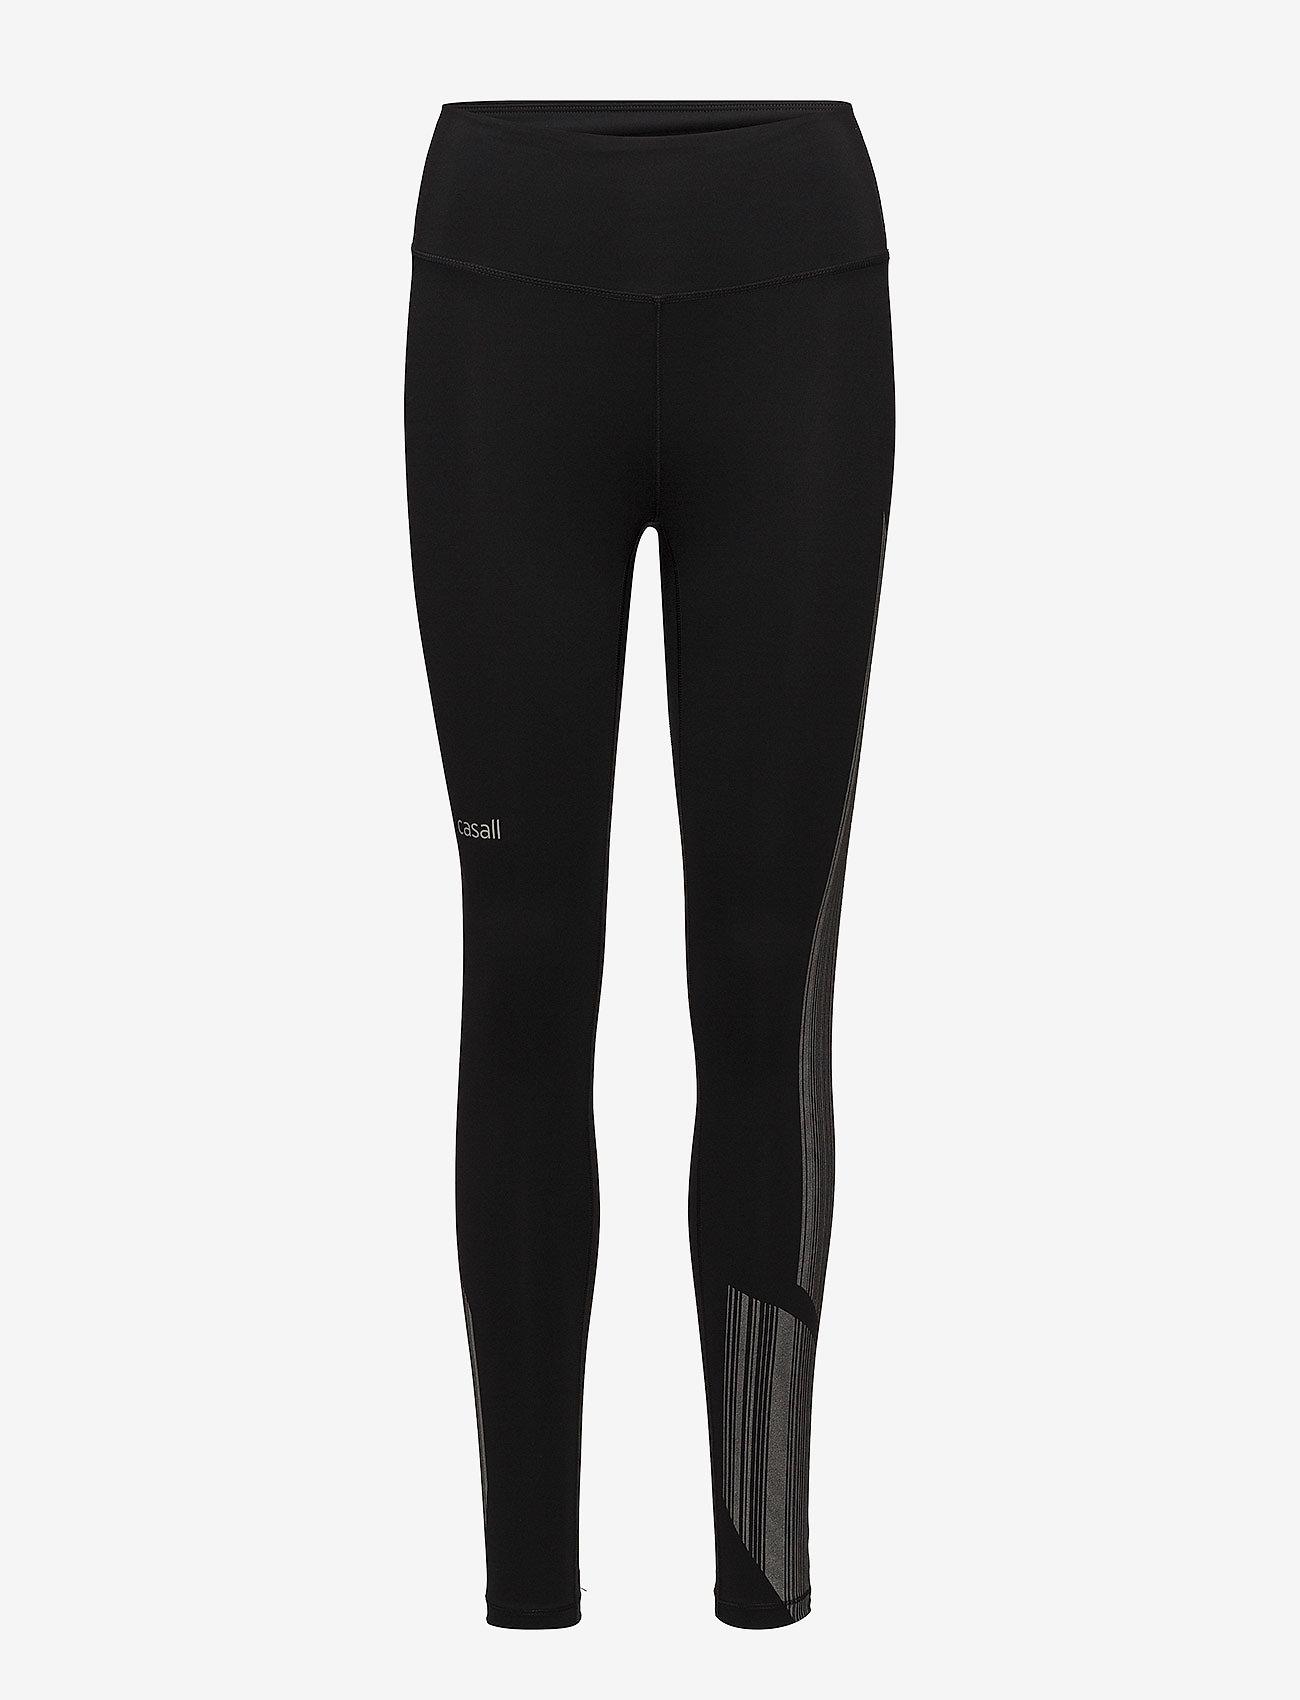 Casall Winner tights - Leginsy BLACK - Kobiety Odzież.